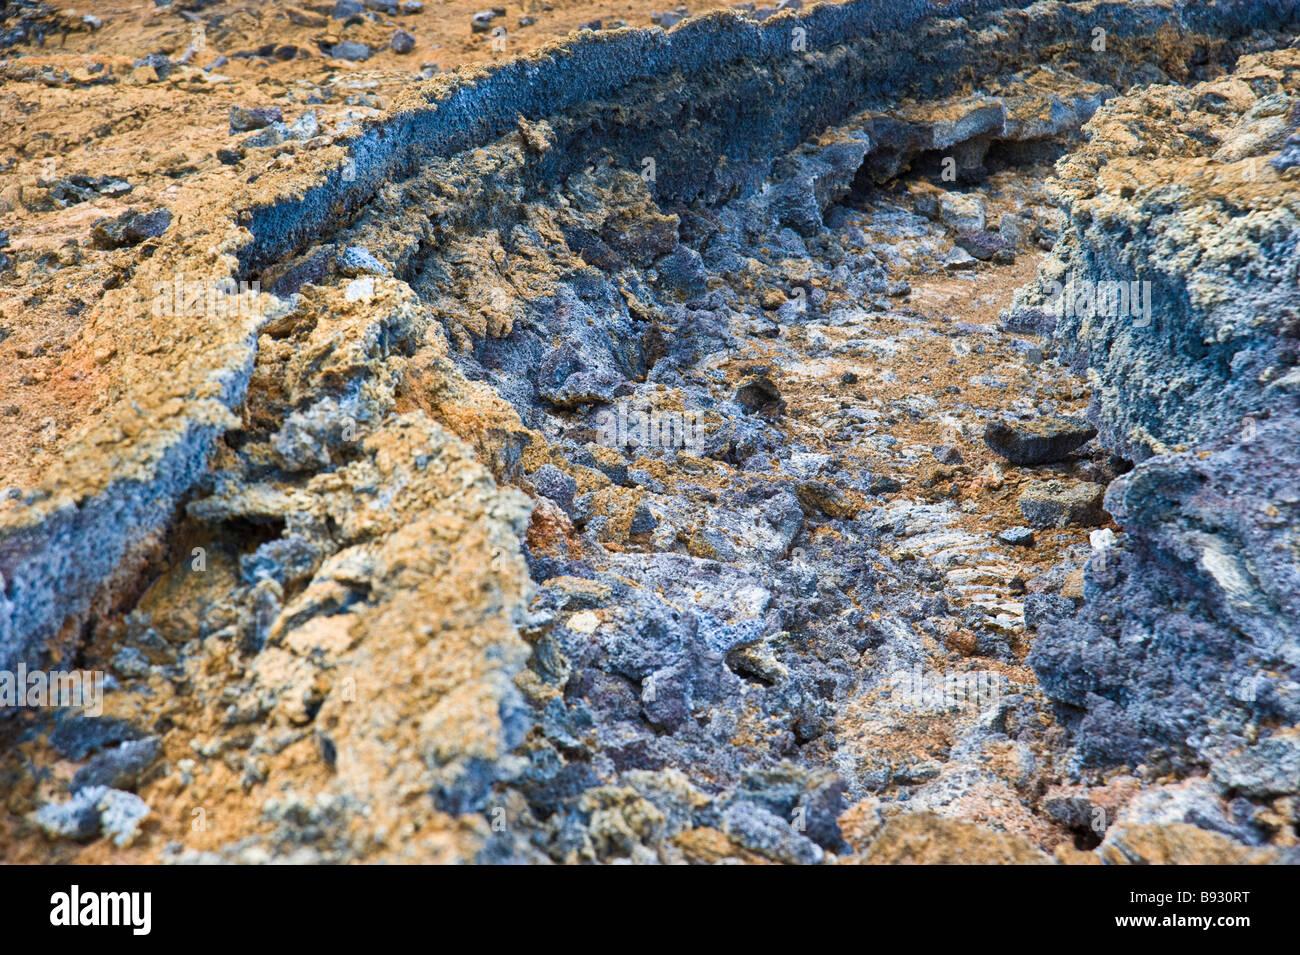 Cold lava flow from volcano at La Réunion, Indian Ocean, France | Kalter Lava Fluss, La Reunion, Indischer - Stock Image